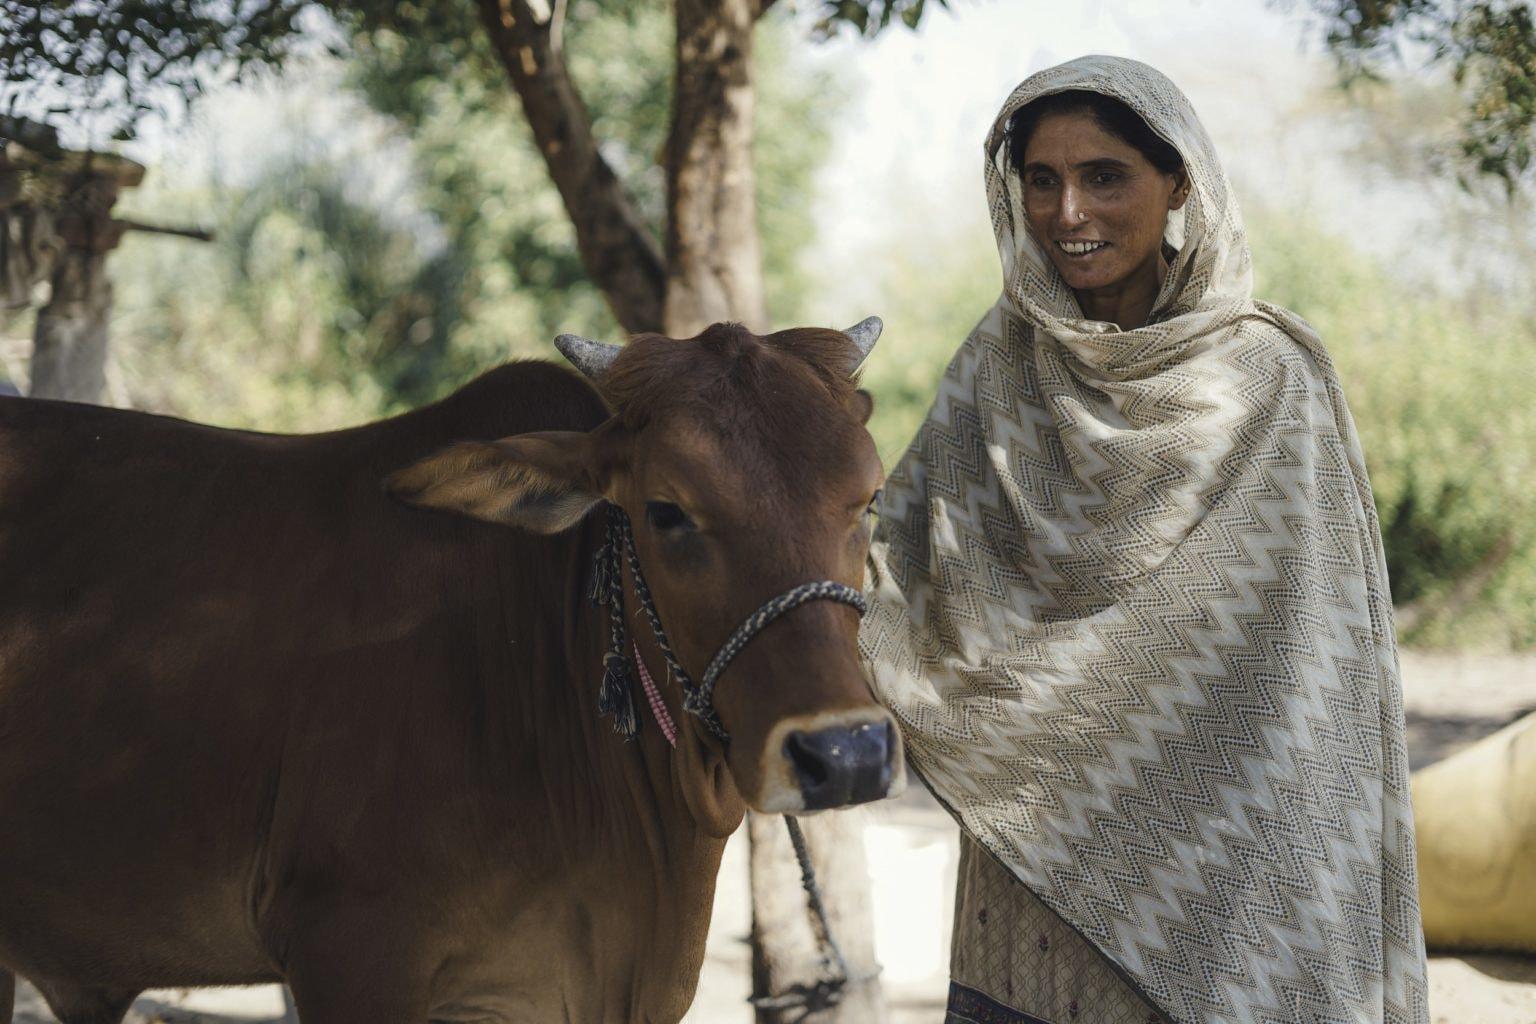 Rizwana Solangi, a farmer, in her village Qasim Solangi, district Hyderabad. — Photo by Manoj Genani